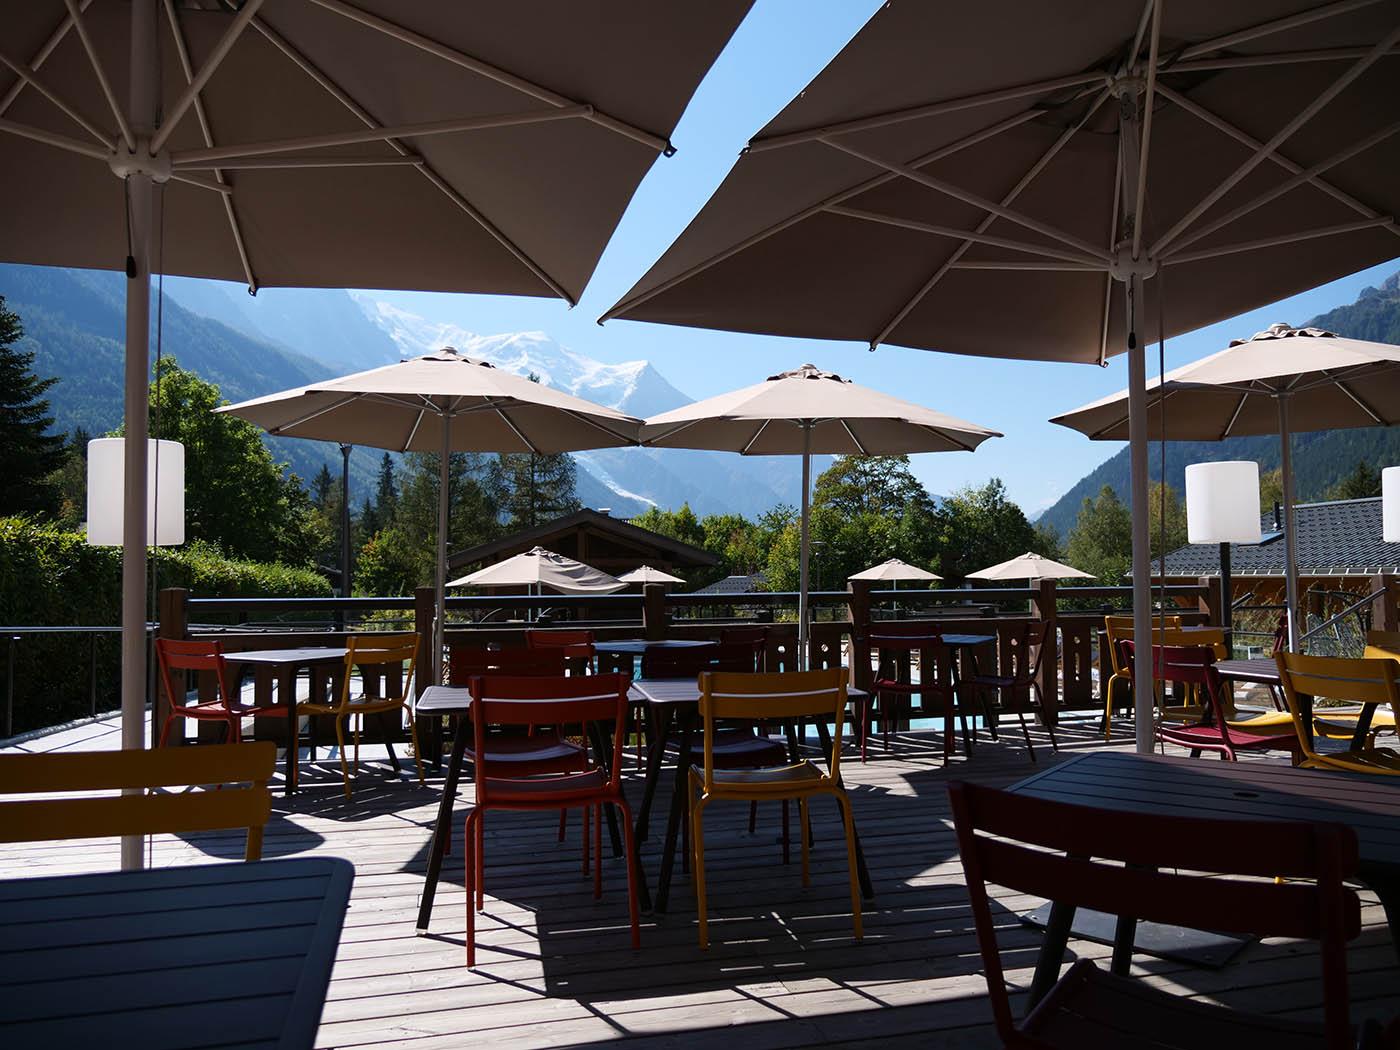 Hotel Spa Chamonix Best Western